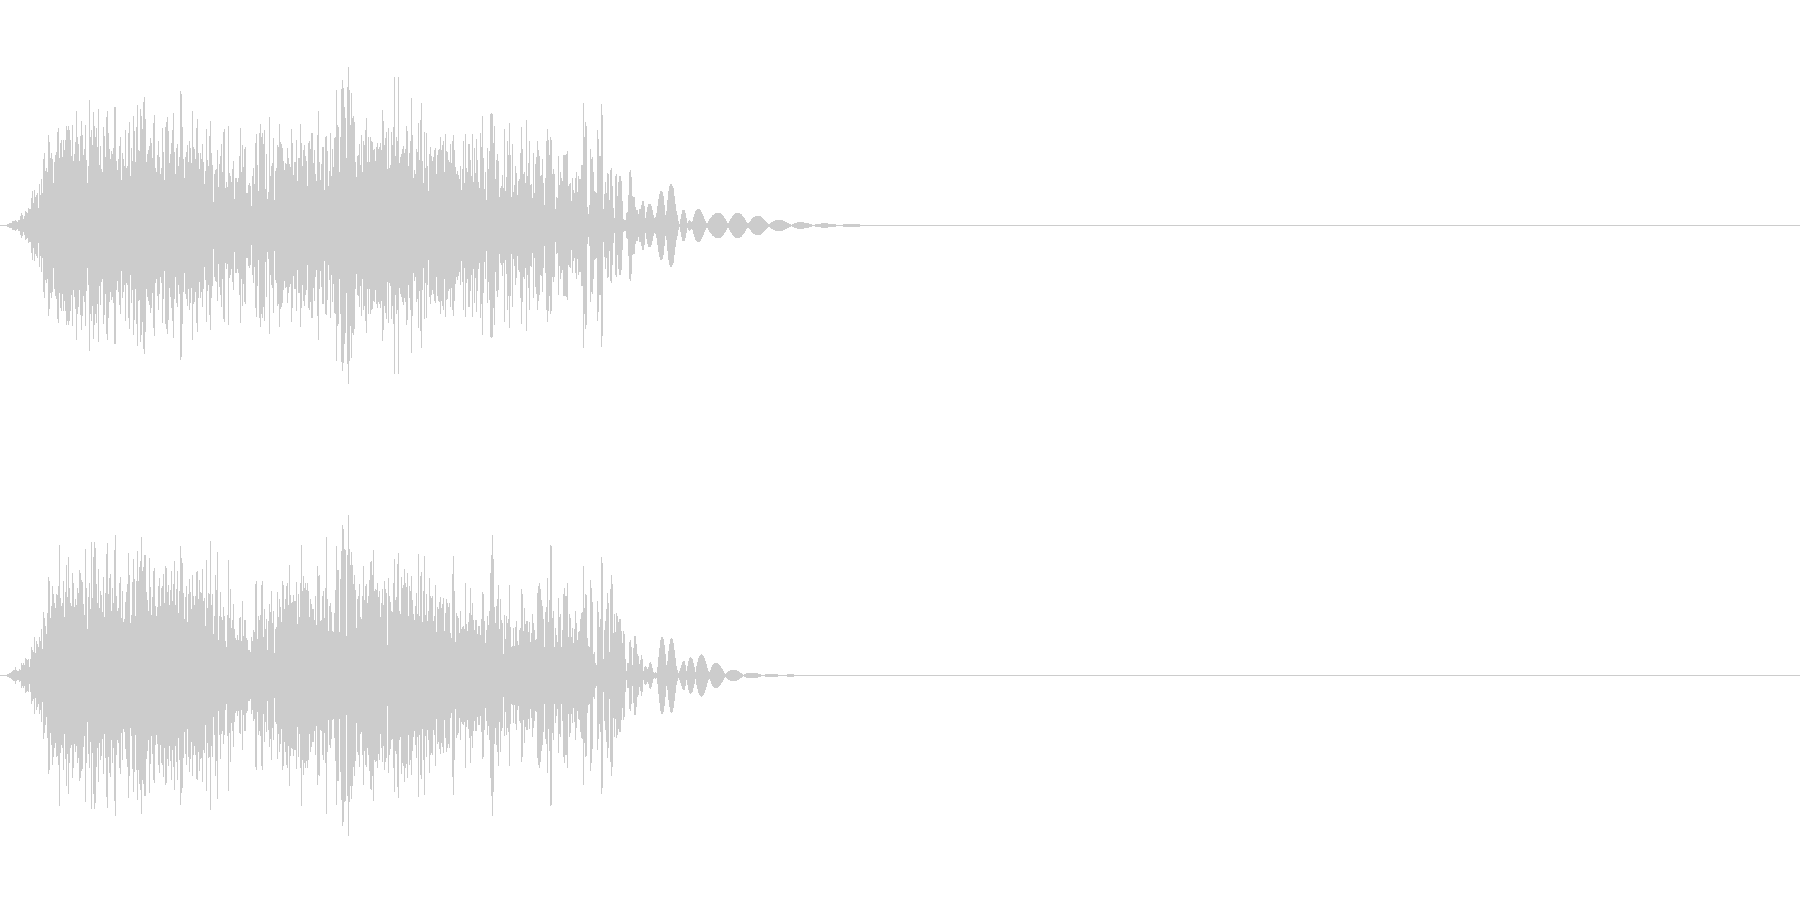 DJスクラッチ07_ワンショット02の未再生の波形